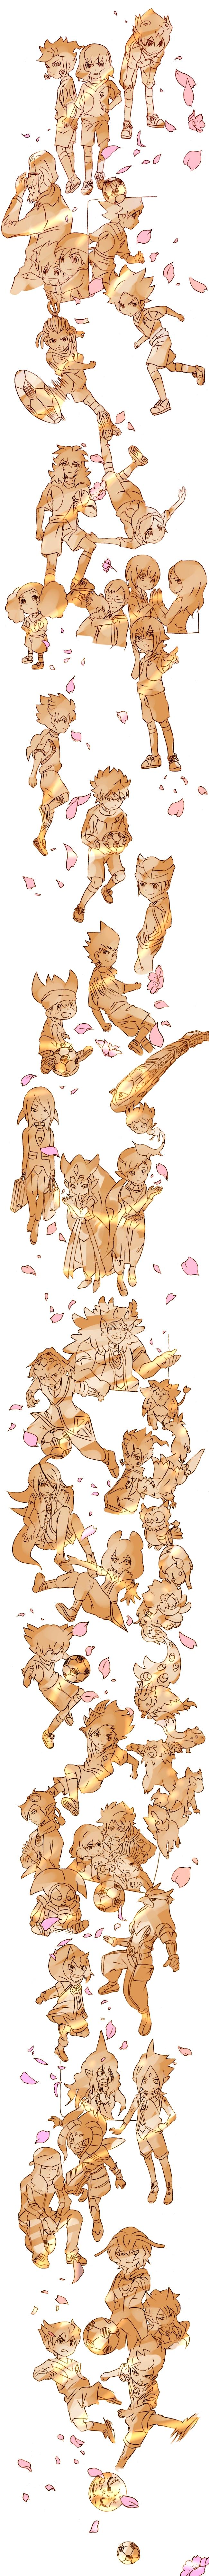 Tags: Anime, Pixiv Id 3852549, Inazuma Eleven GO Galaxy, Inazuma Eleven GO, Katra Paige, Minaho Kazuto, Ookami (Soul), Matatagi Yuuta, Acrous Obies, Hakuryuu (Inazuma Eleven), Hayabusa (Soul), Kuroiwa Ryuusei, Ratel